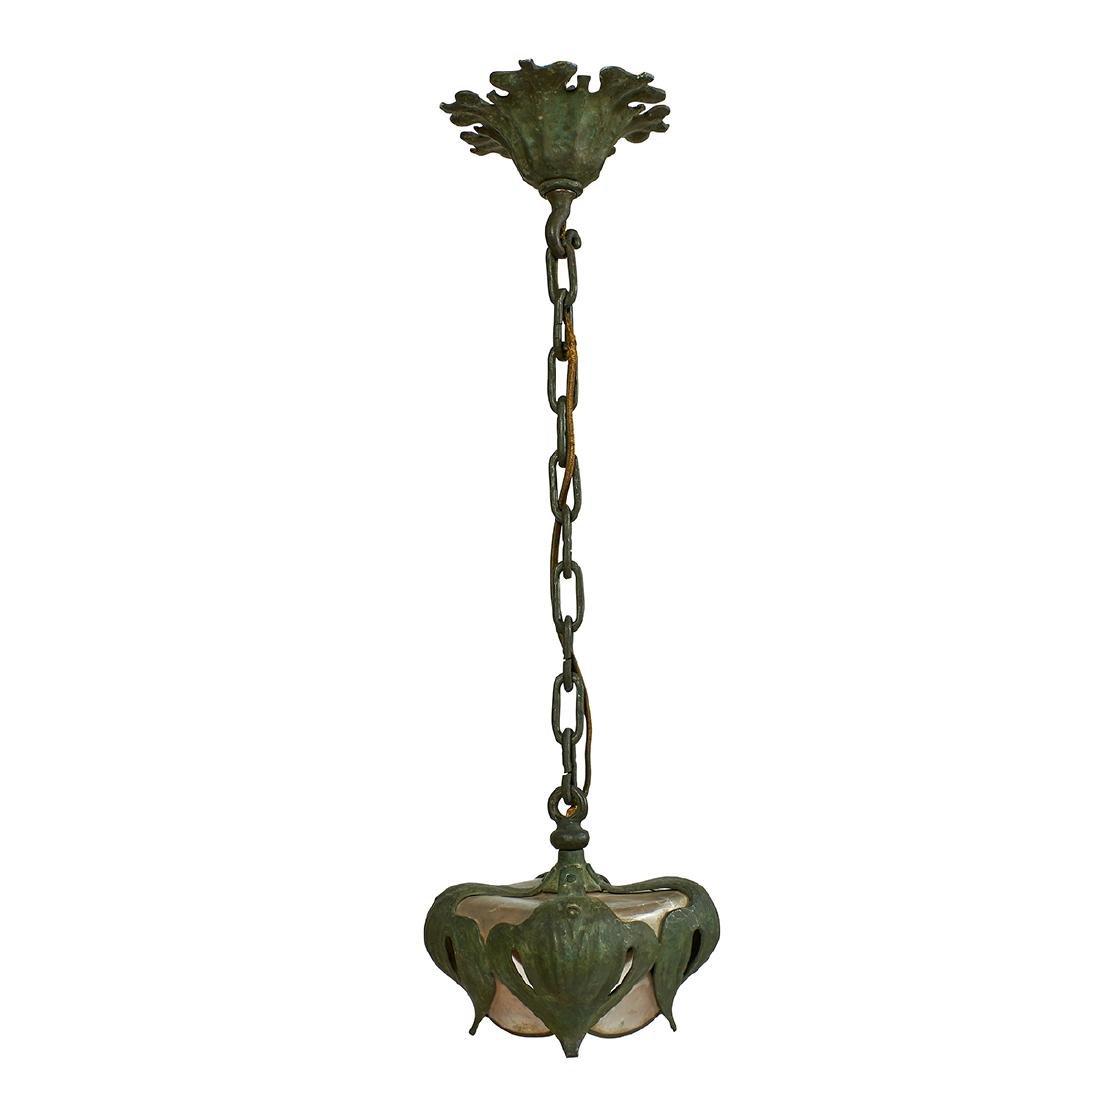 American Art Nouveau, Hanging Light Fixture - 2